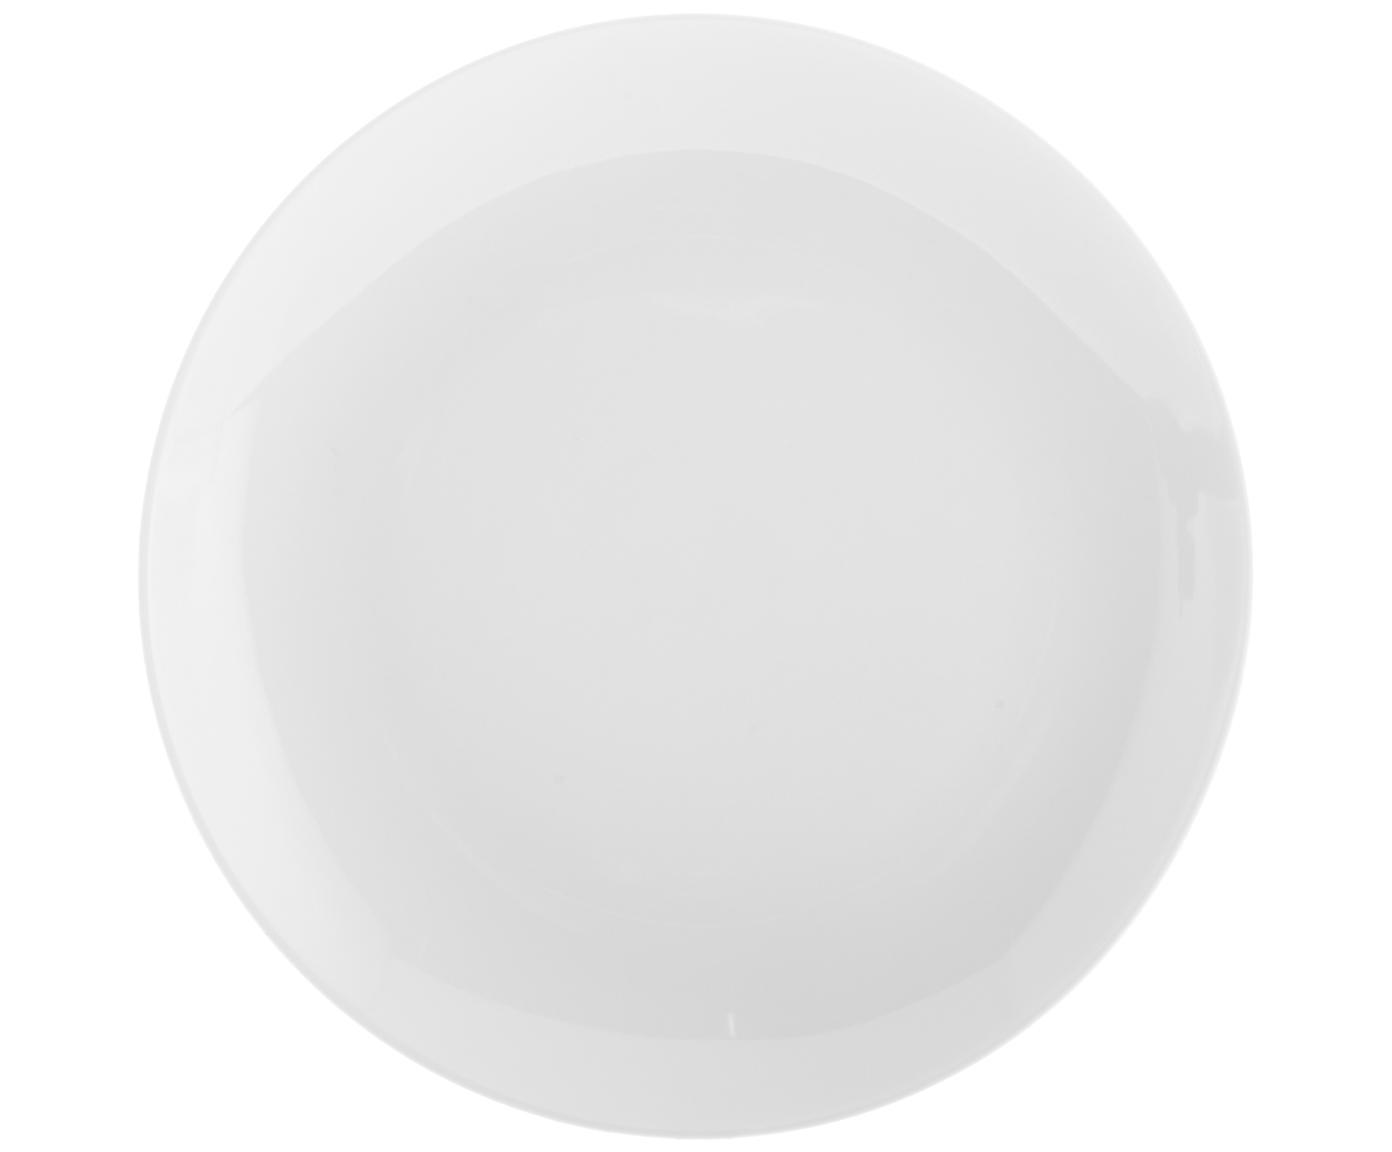 Ontbijtborden Delight Modern, 2 stuks, Porselein, Wit, Ø 20 cm